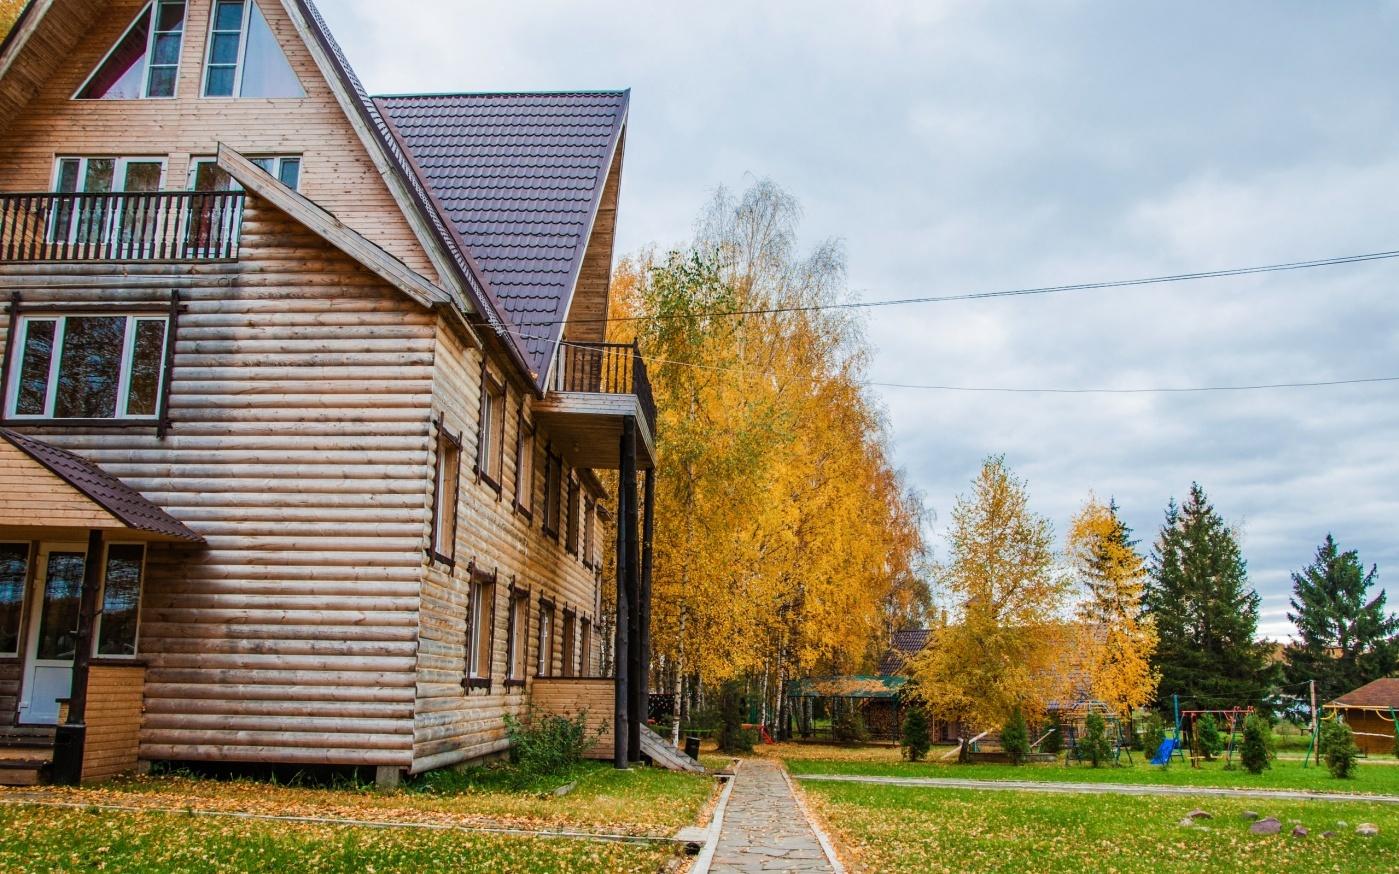 База отдыха «Хаски-хаус» Нижегородская область, фото 18